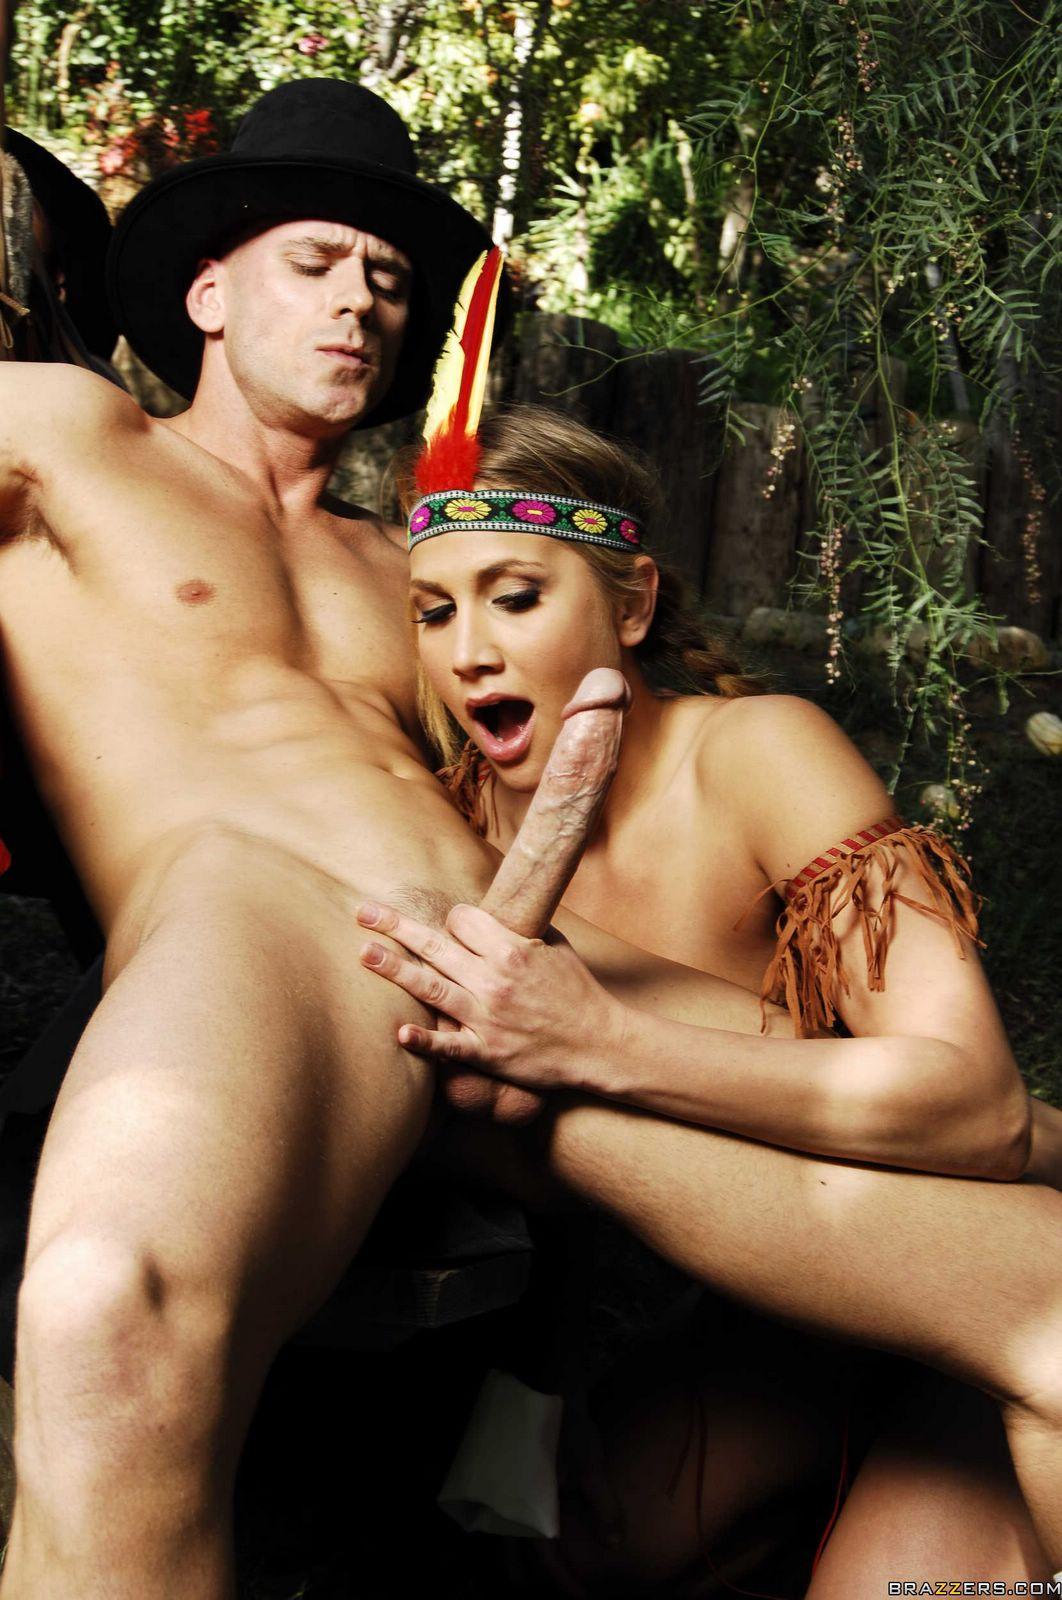 American Porn Hardcore wild xxx hardcore pilgrims and indians porn | free download